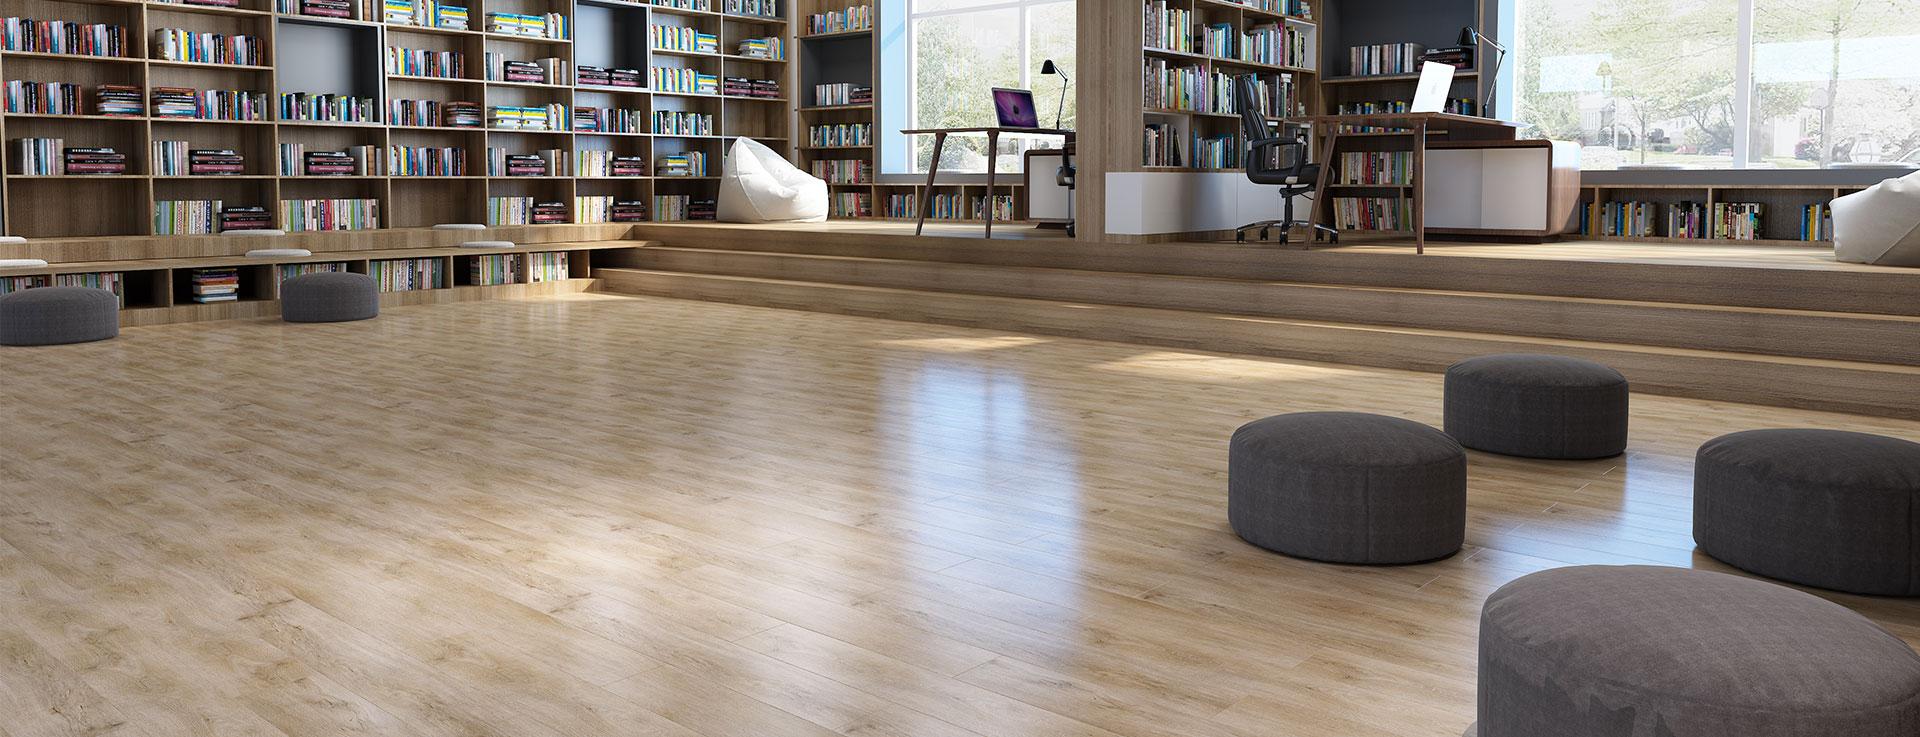 alvera lantai vinyl motif kayu meredam suara pada perpustakaan